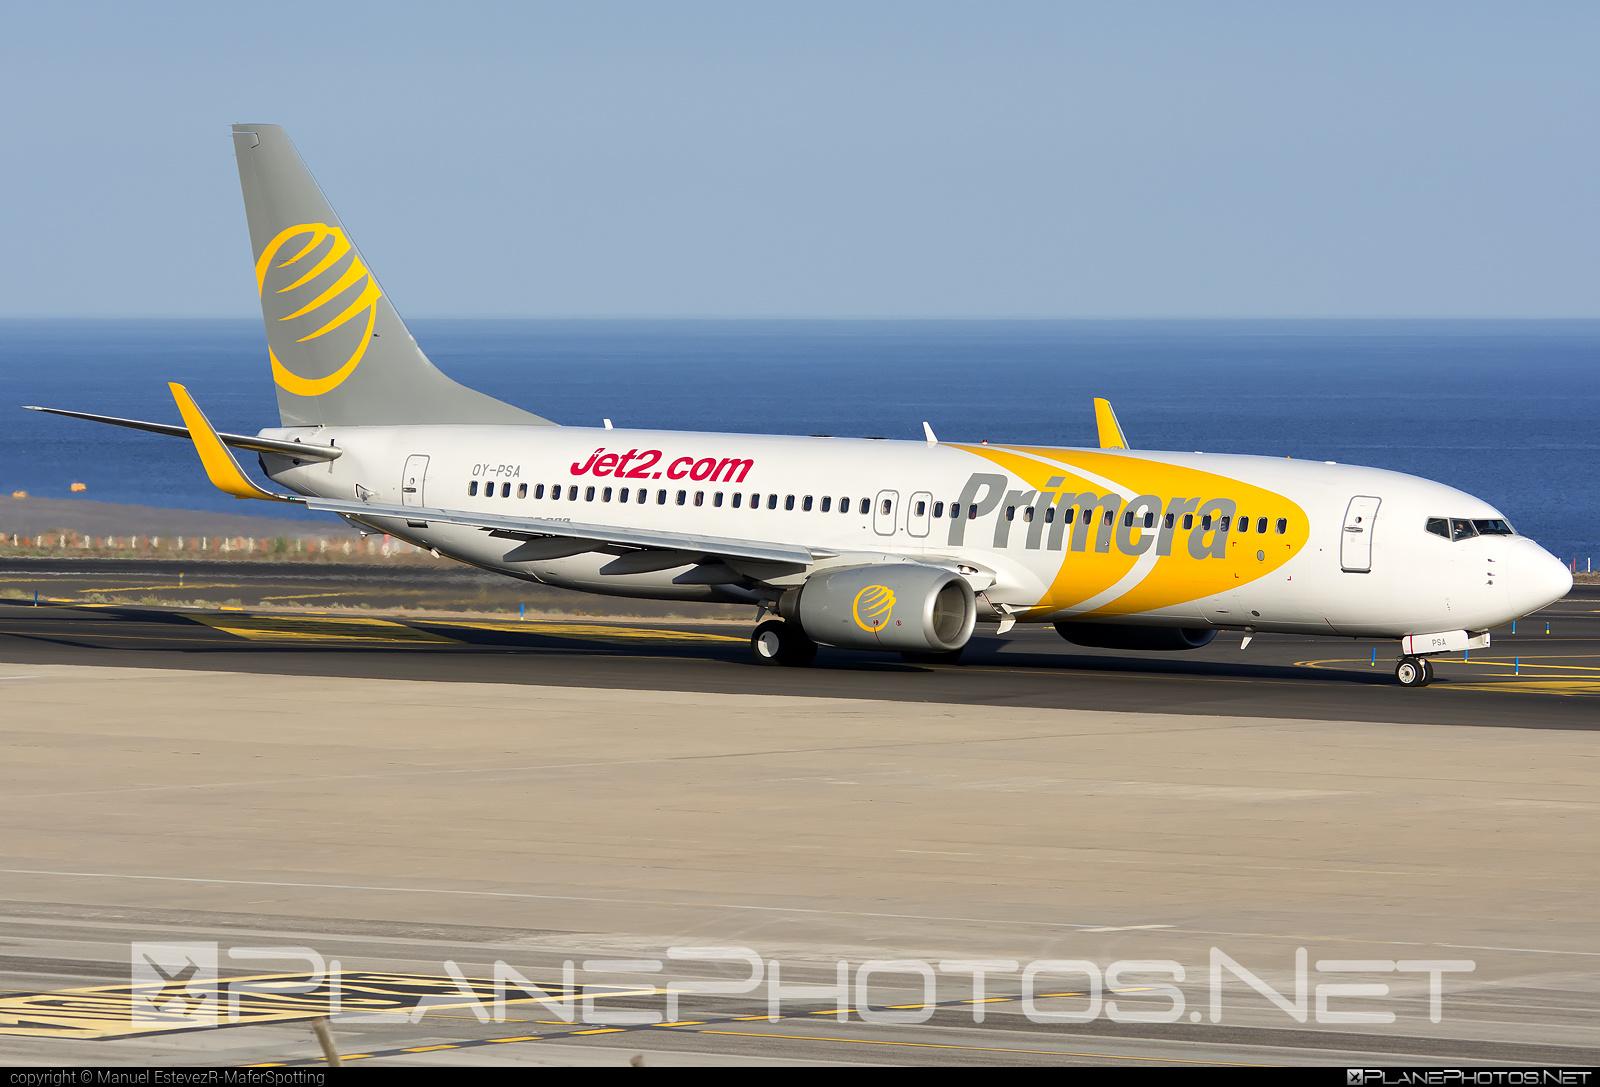 Boeing 737-800 - OY-PSA operated by Jet2 #b737 #b737nextgen #b737ng #boeing #boeing737 #jet2